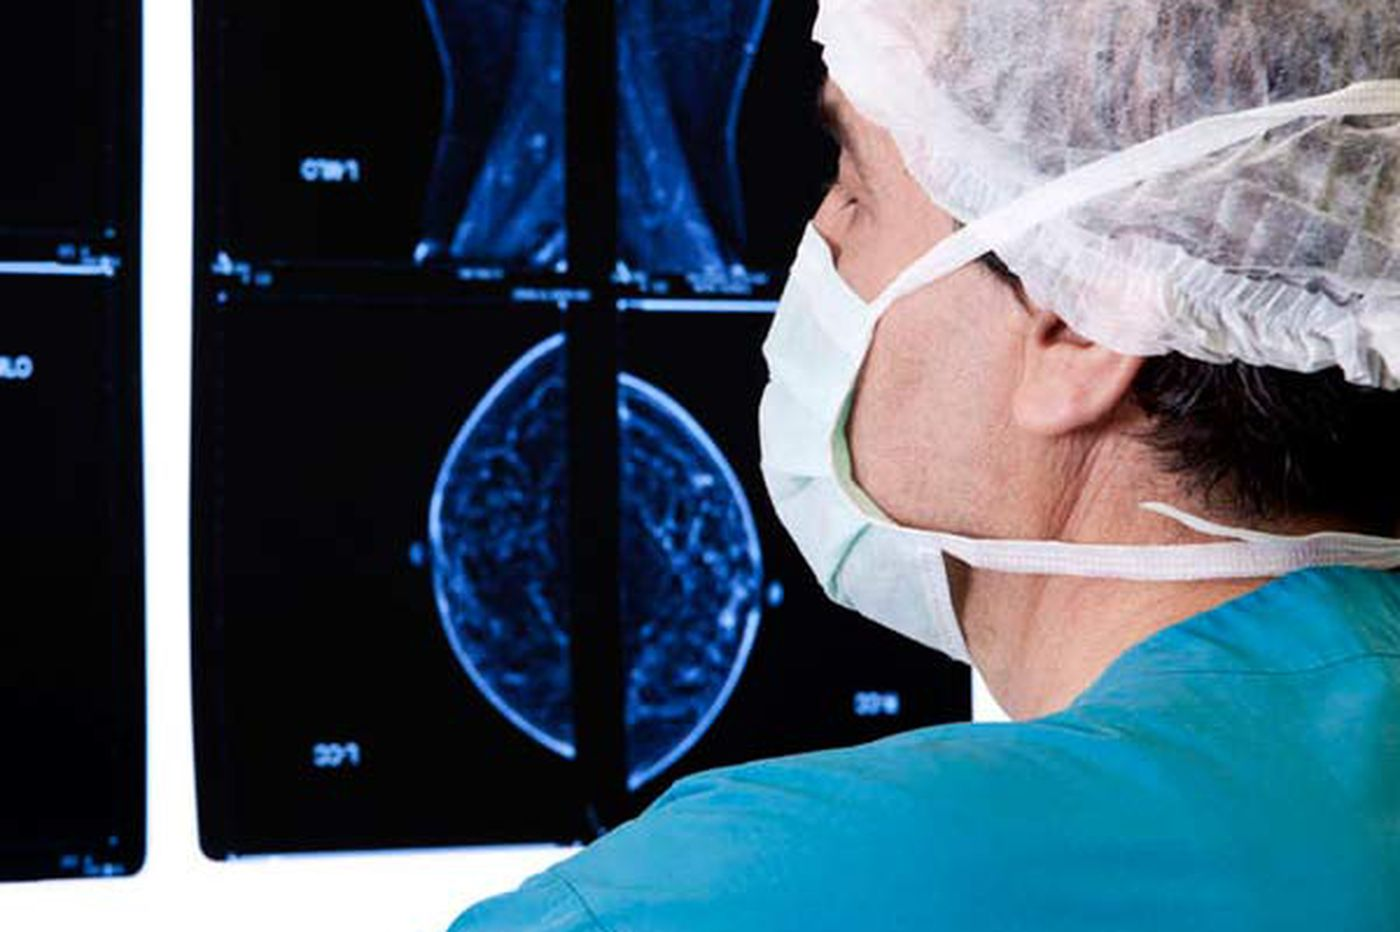 Pa. mandates 3-D mammogram coverage